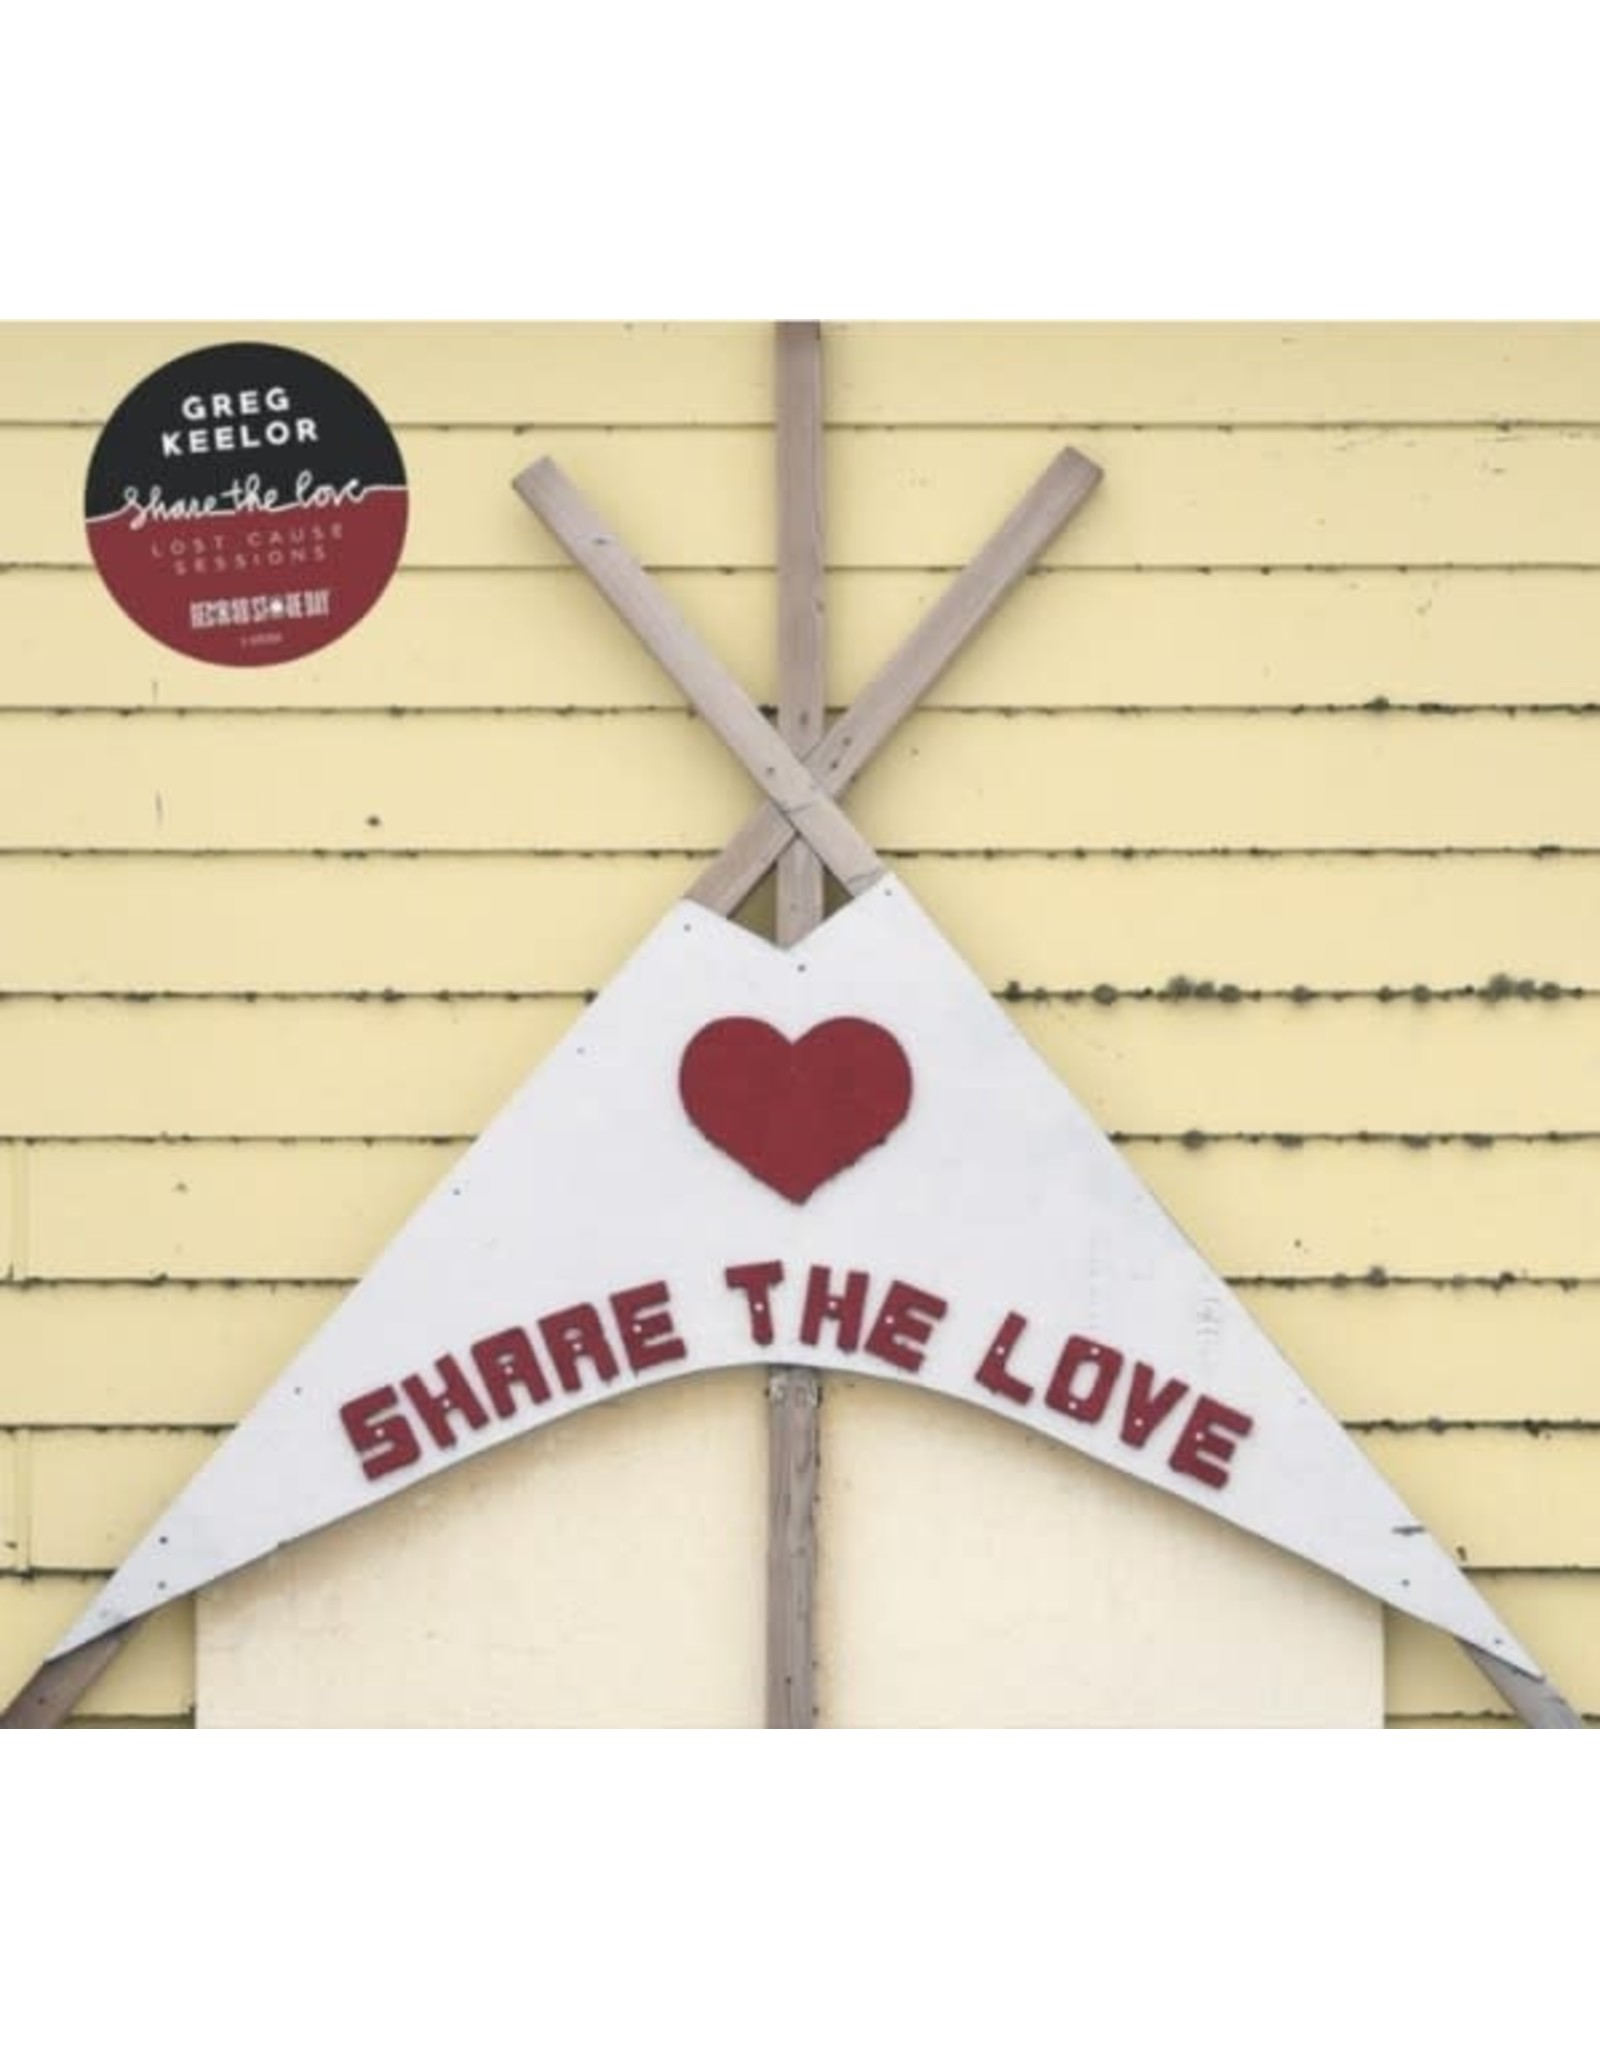 Keelor, Greg - Feel The Love LP (RSD Ltd)